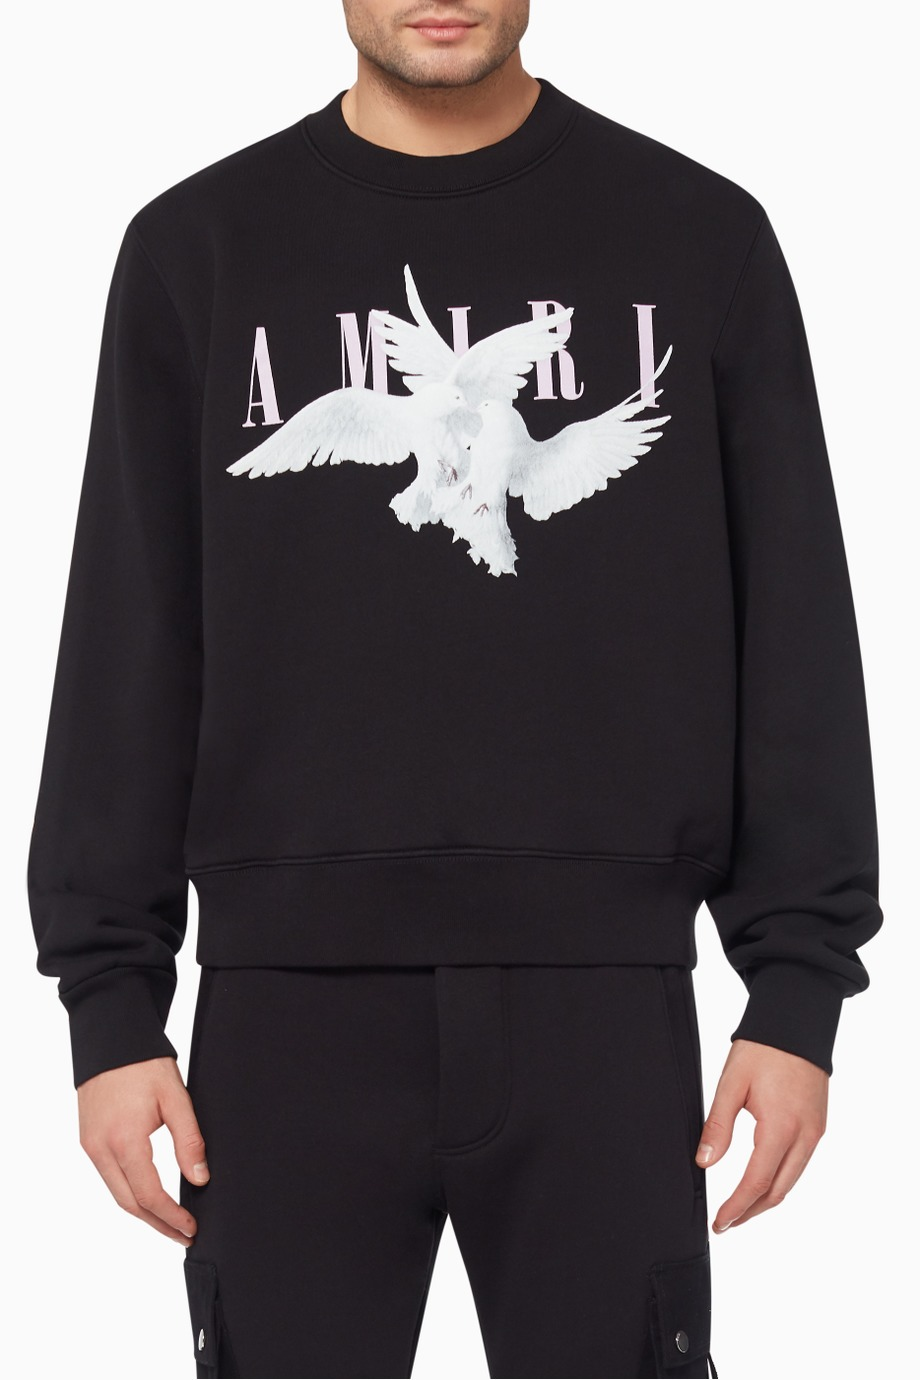 Shop Amiri Black Dual Doves Crewneck Sweatshirt For Men Ounass Uae Sweatshirts Crew Neck Sweatshirt Luxury Brands Fashion [ 1380 x 920 Pixel ]